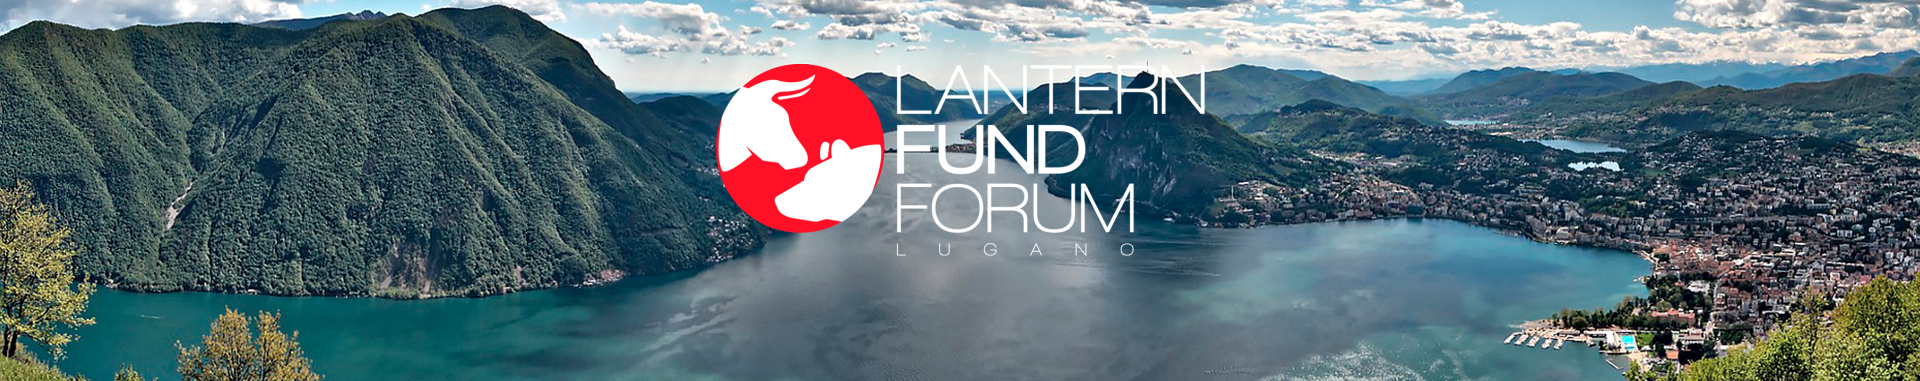 FD Fiduciaria Digitale al Lantern Fund Forum